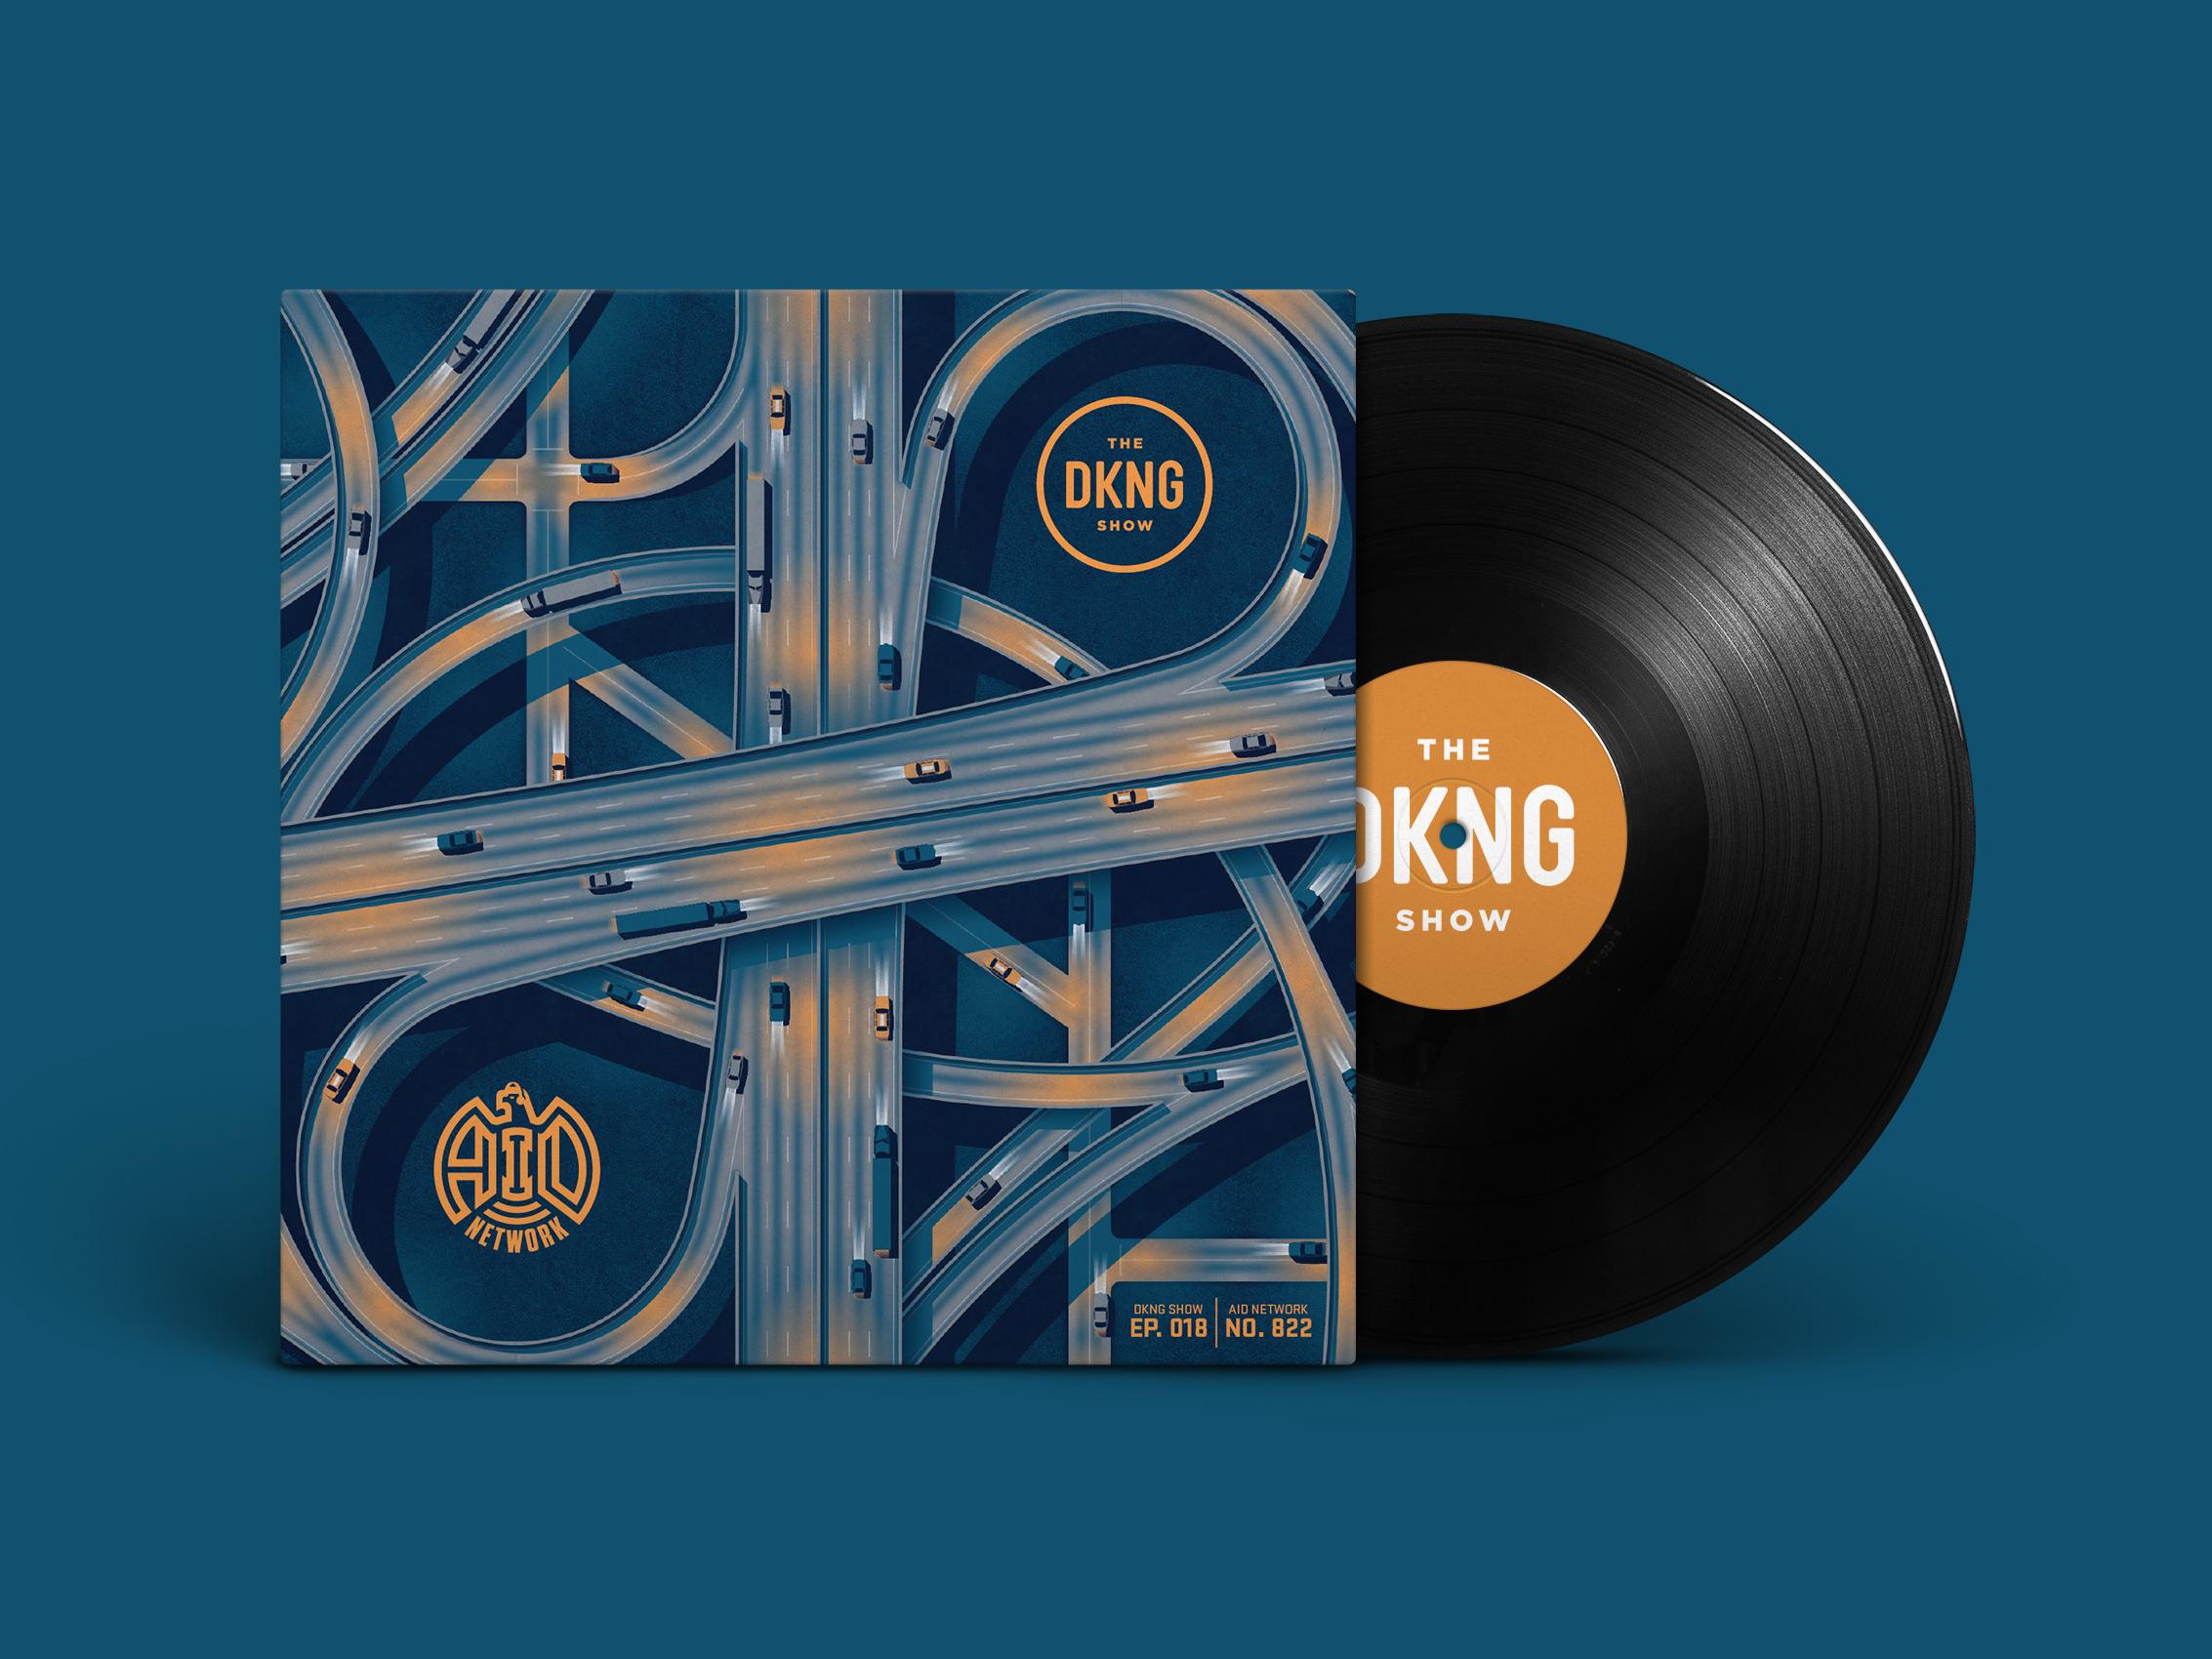 Aid vinyl 18